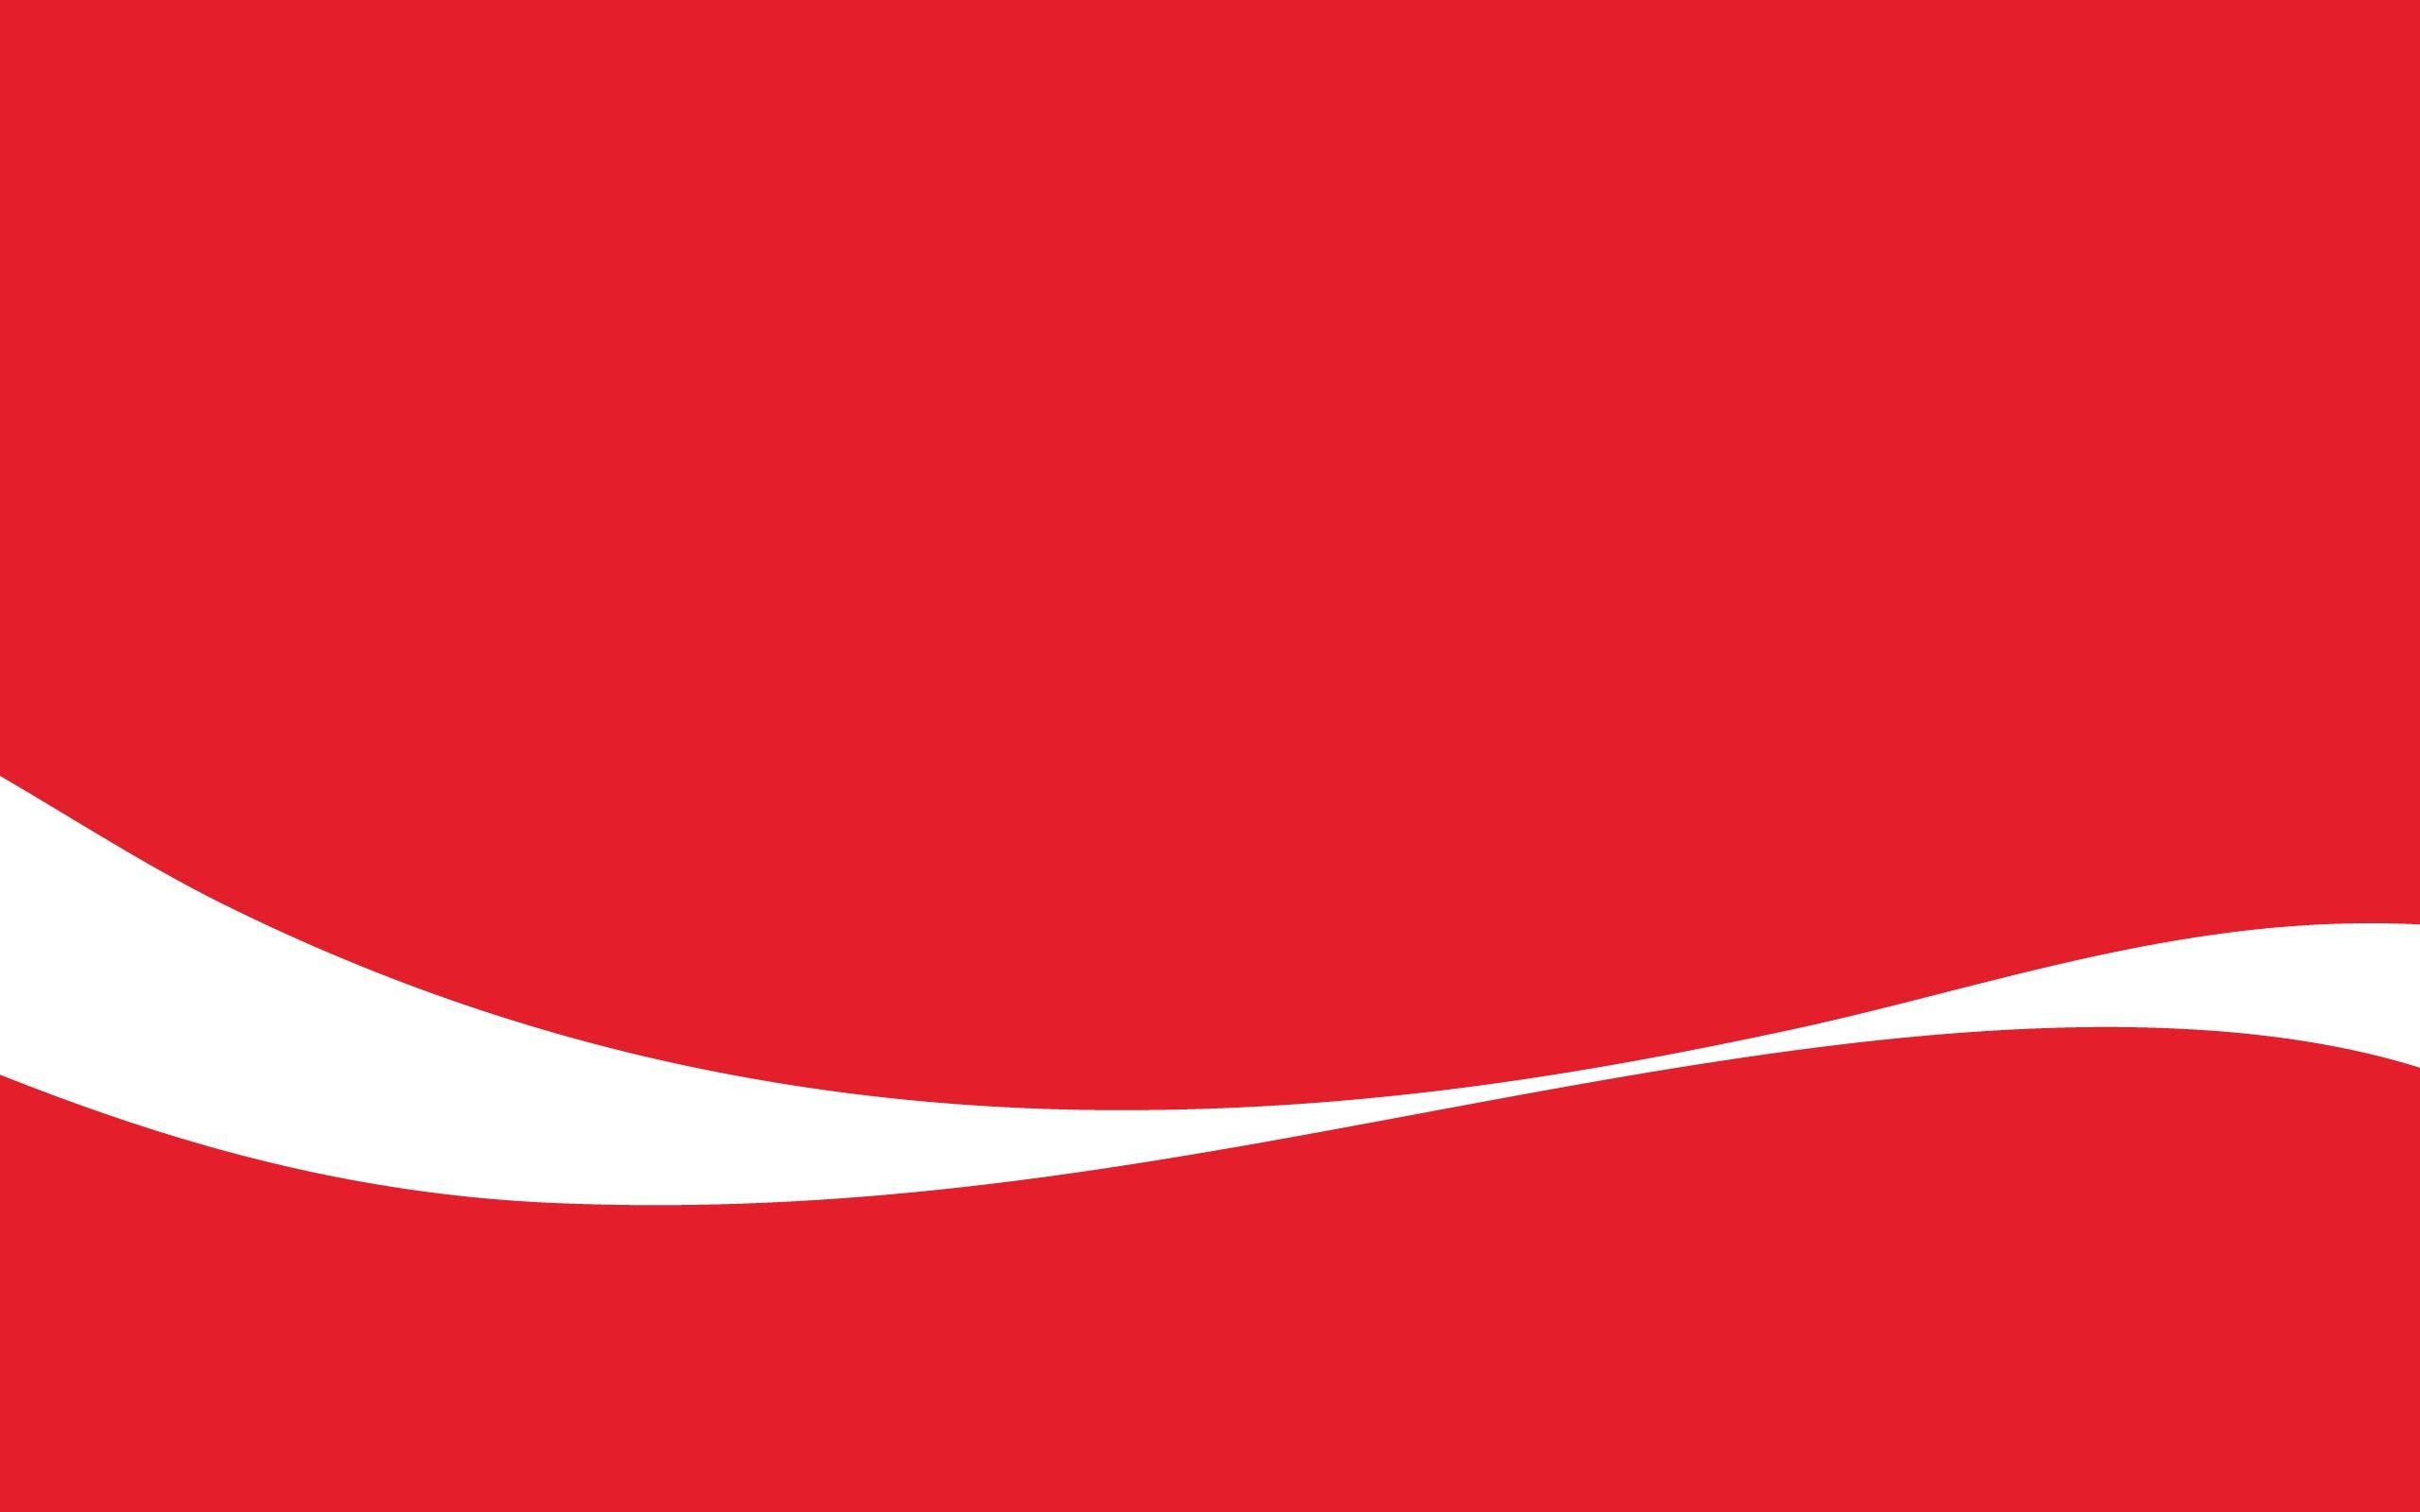 coca cola powerpoint template erieairfair